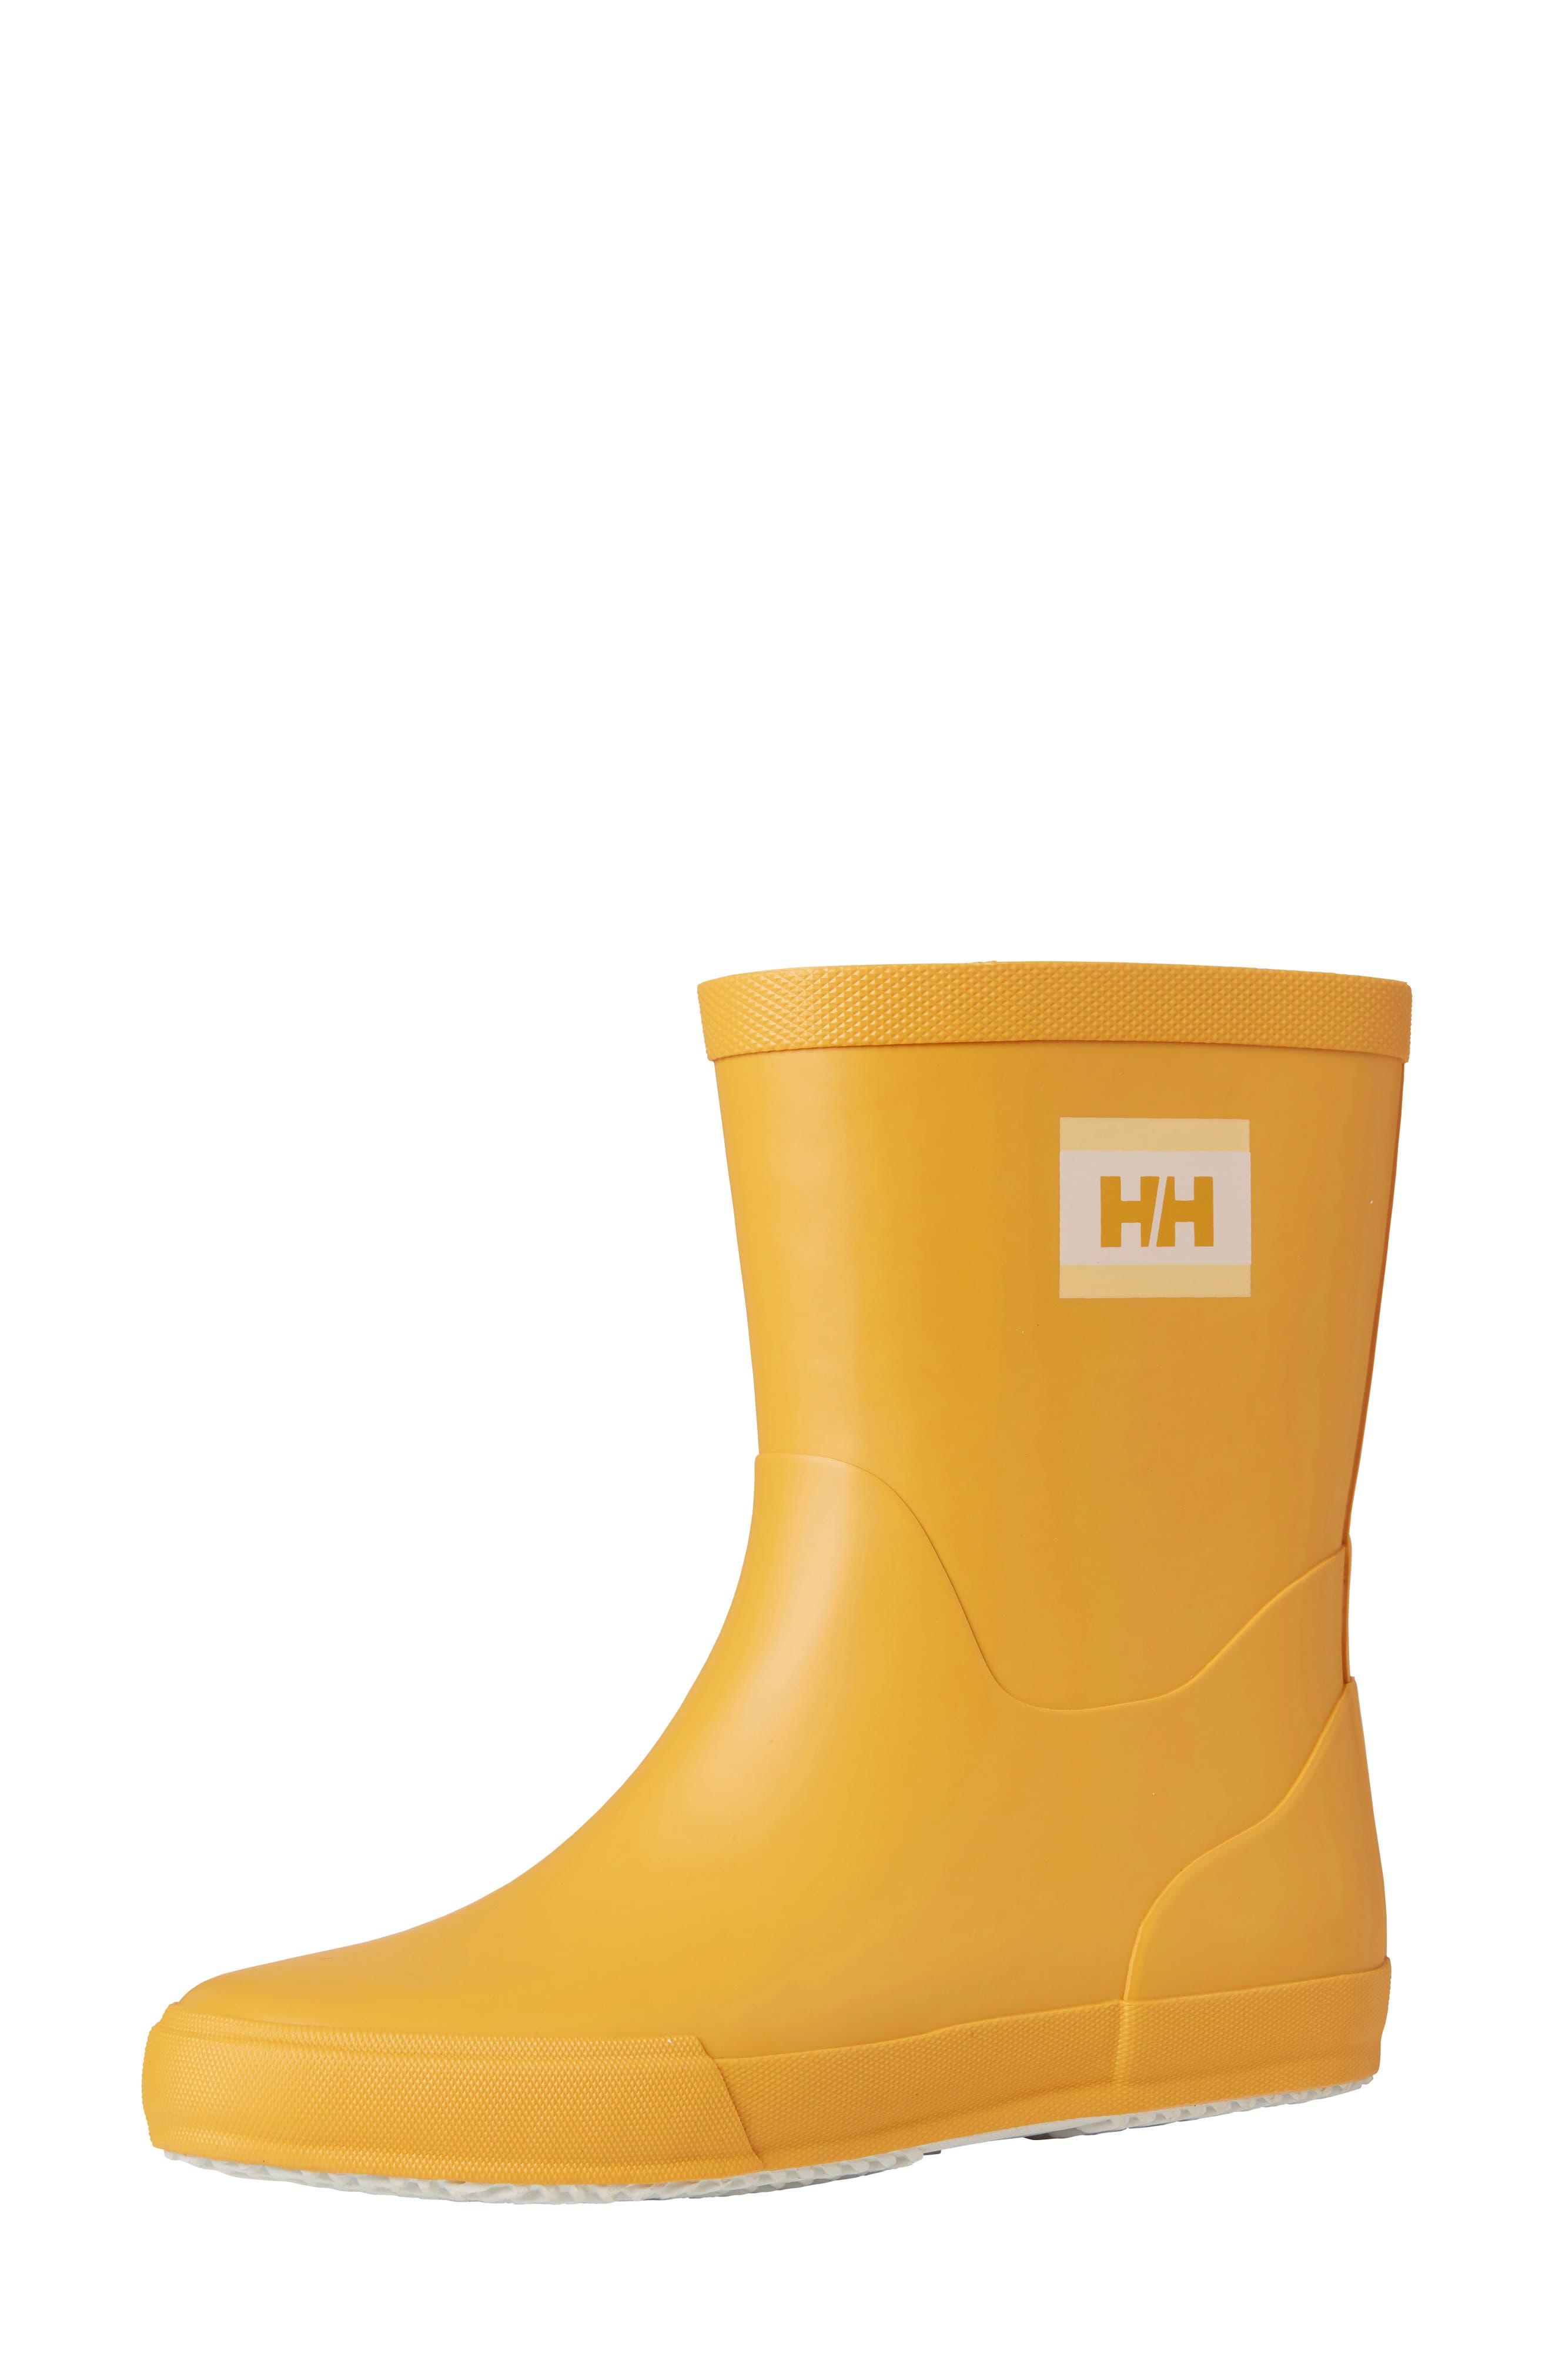 Women's Helly Hanson Nordvik 2 Waterproof Rain Boot